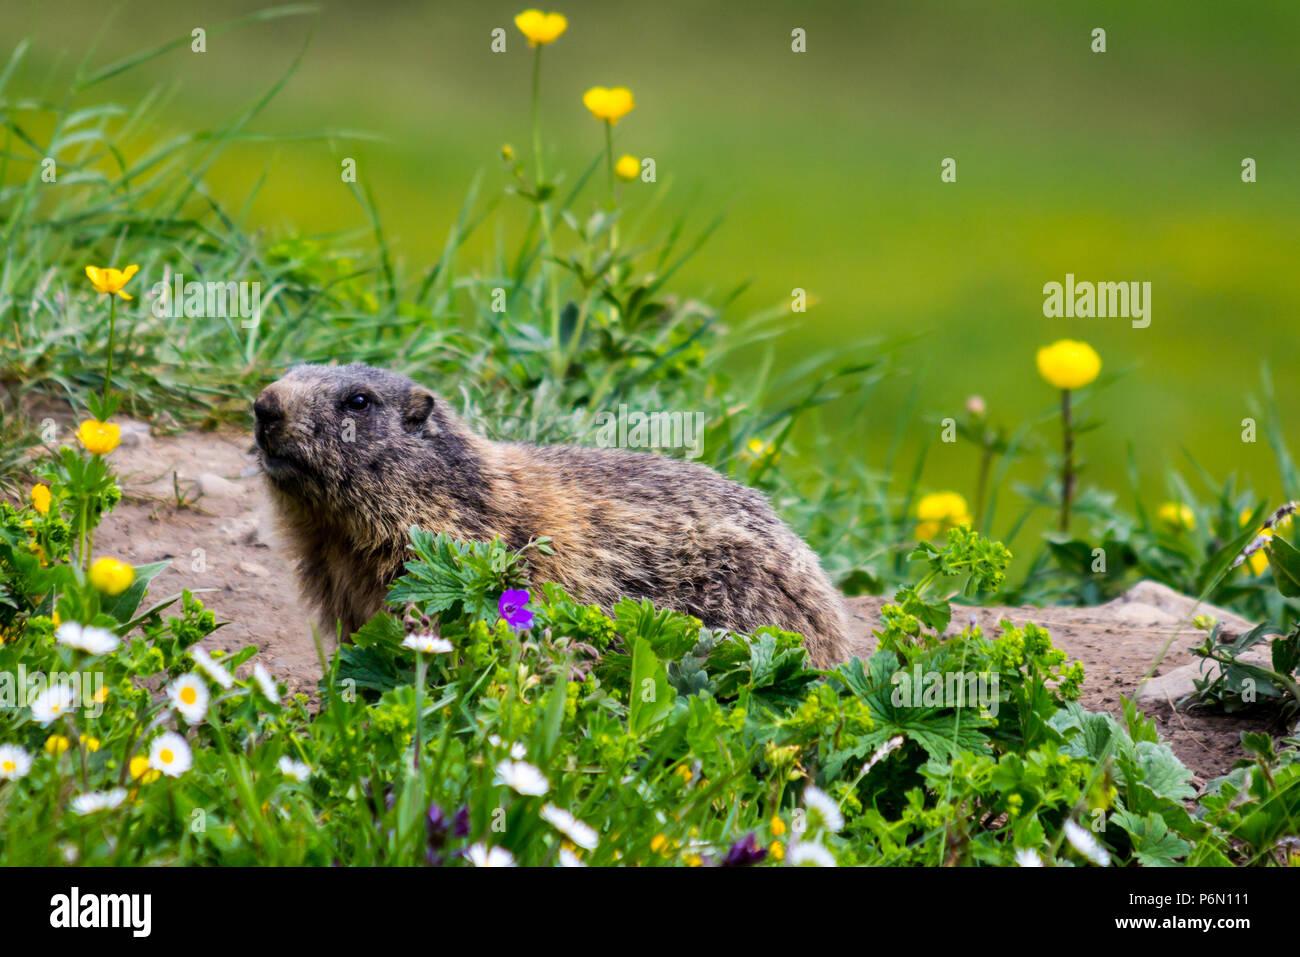 Curious groundhog (marmot, alpine marmot, woodchuck) looking on spring flower field in the European Alps of Liechtenstein - Stock Image